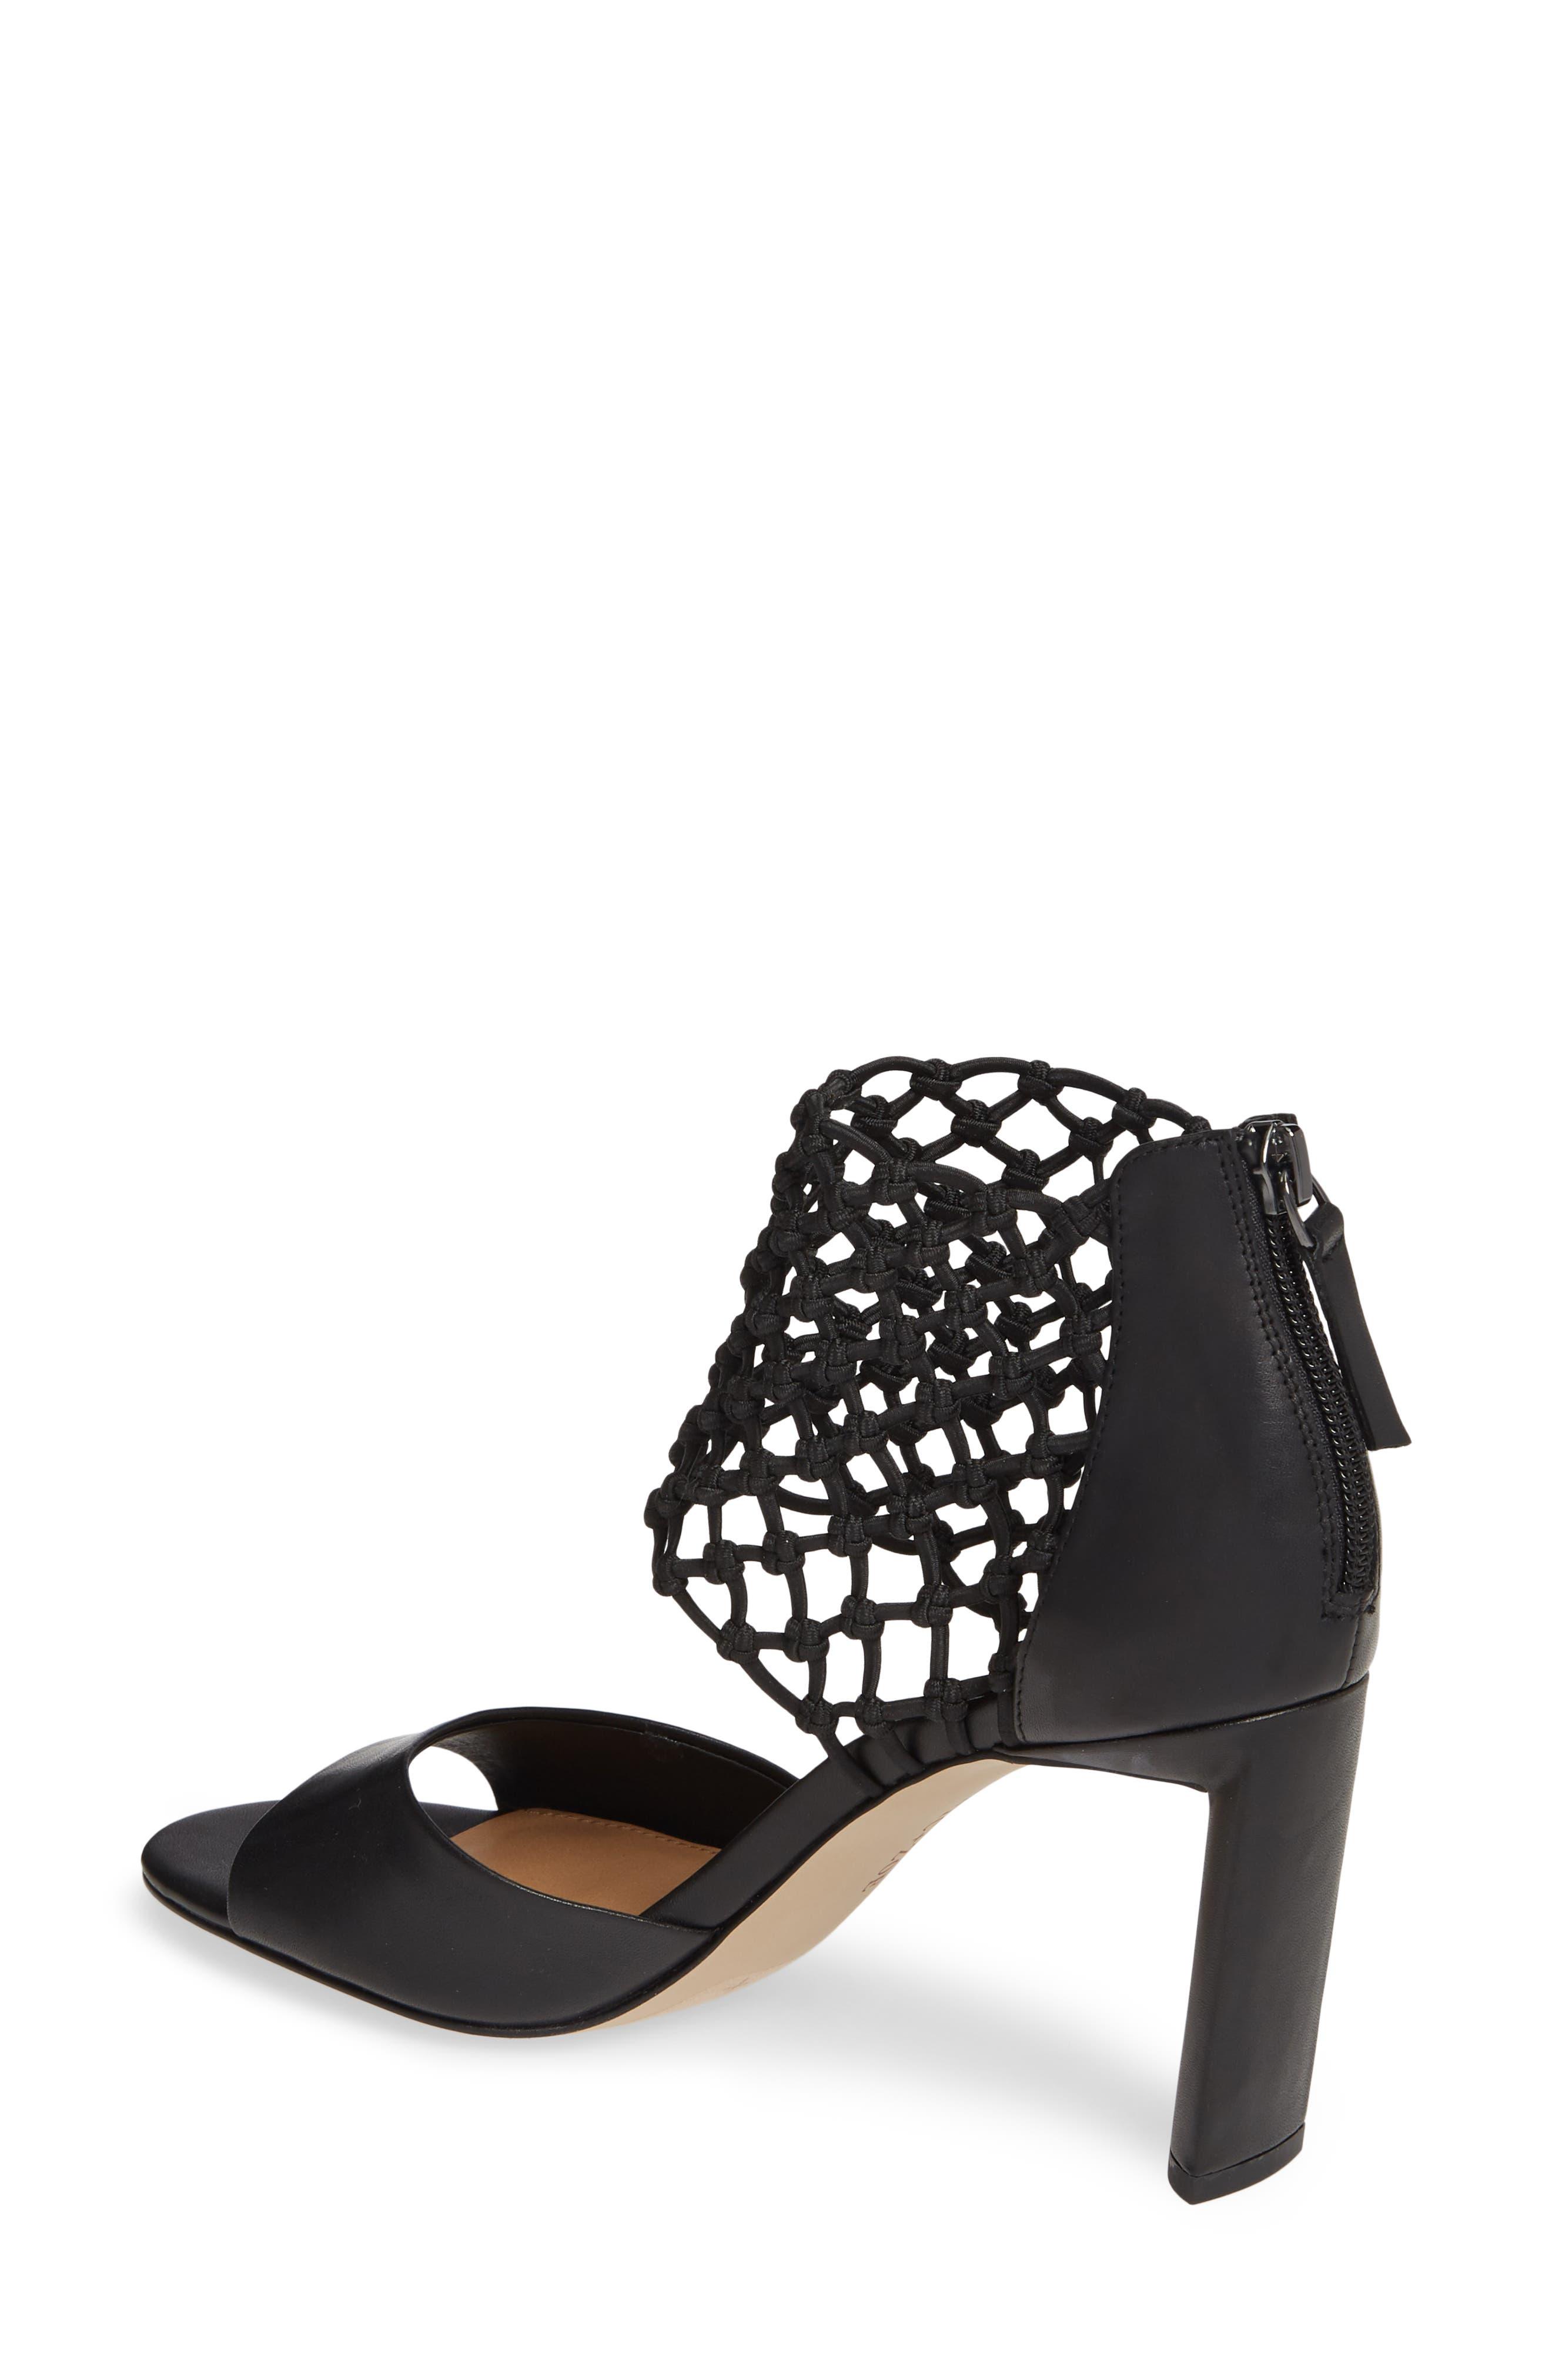 NIC+ZOE, Nobel Net Shield Sandal, Alternate thumbnail 2, color, BLACK LEATHER